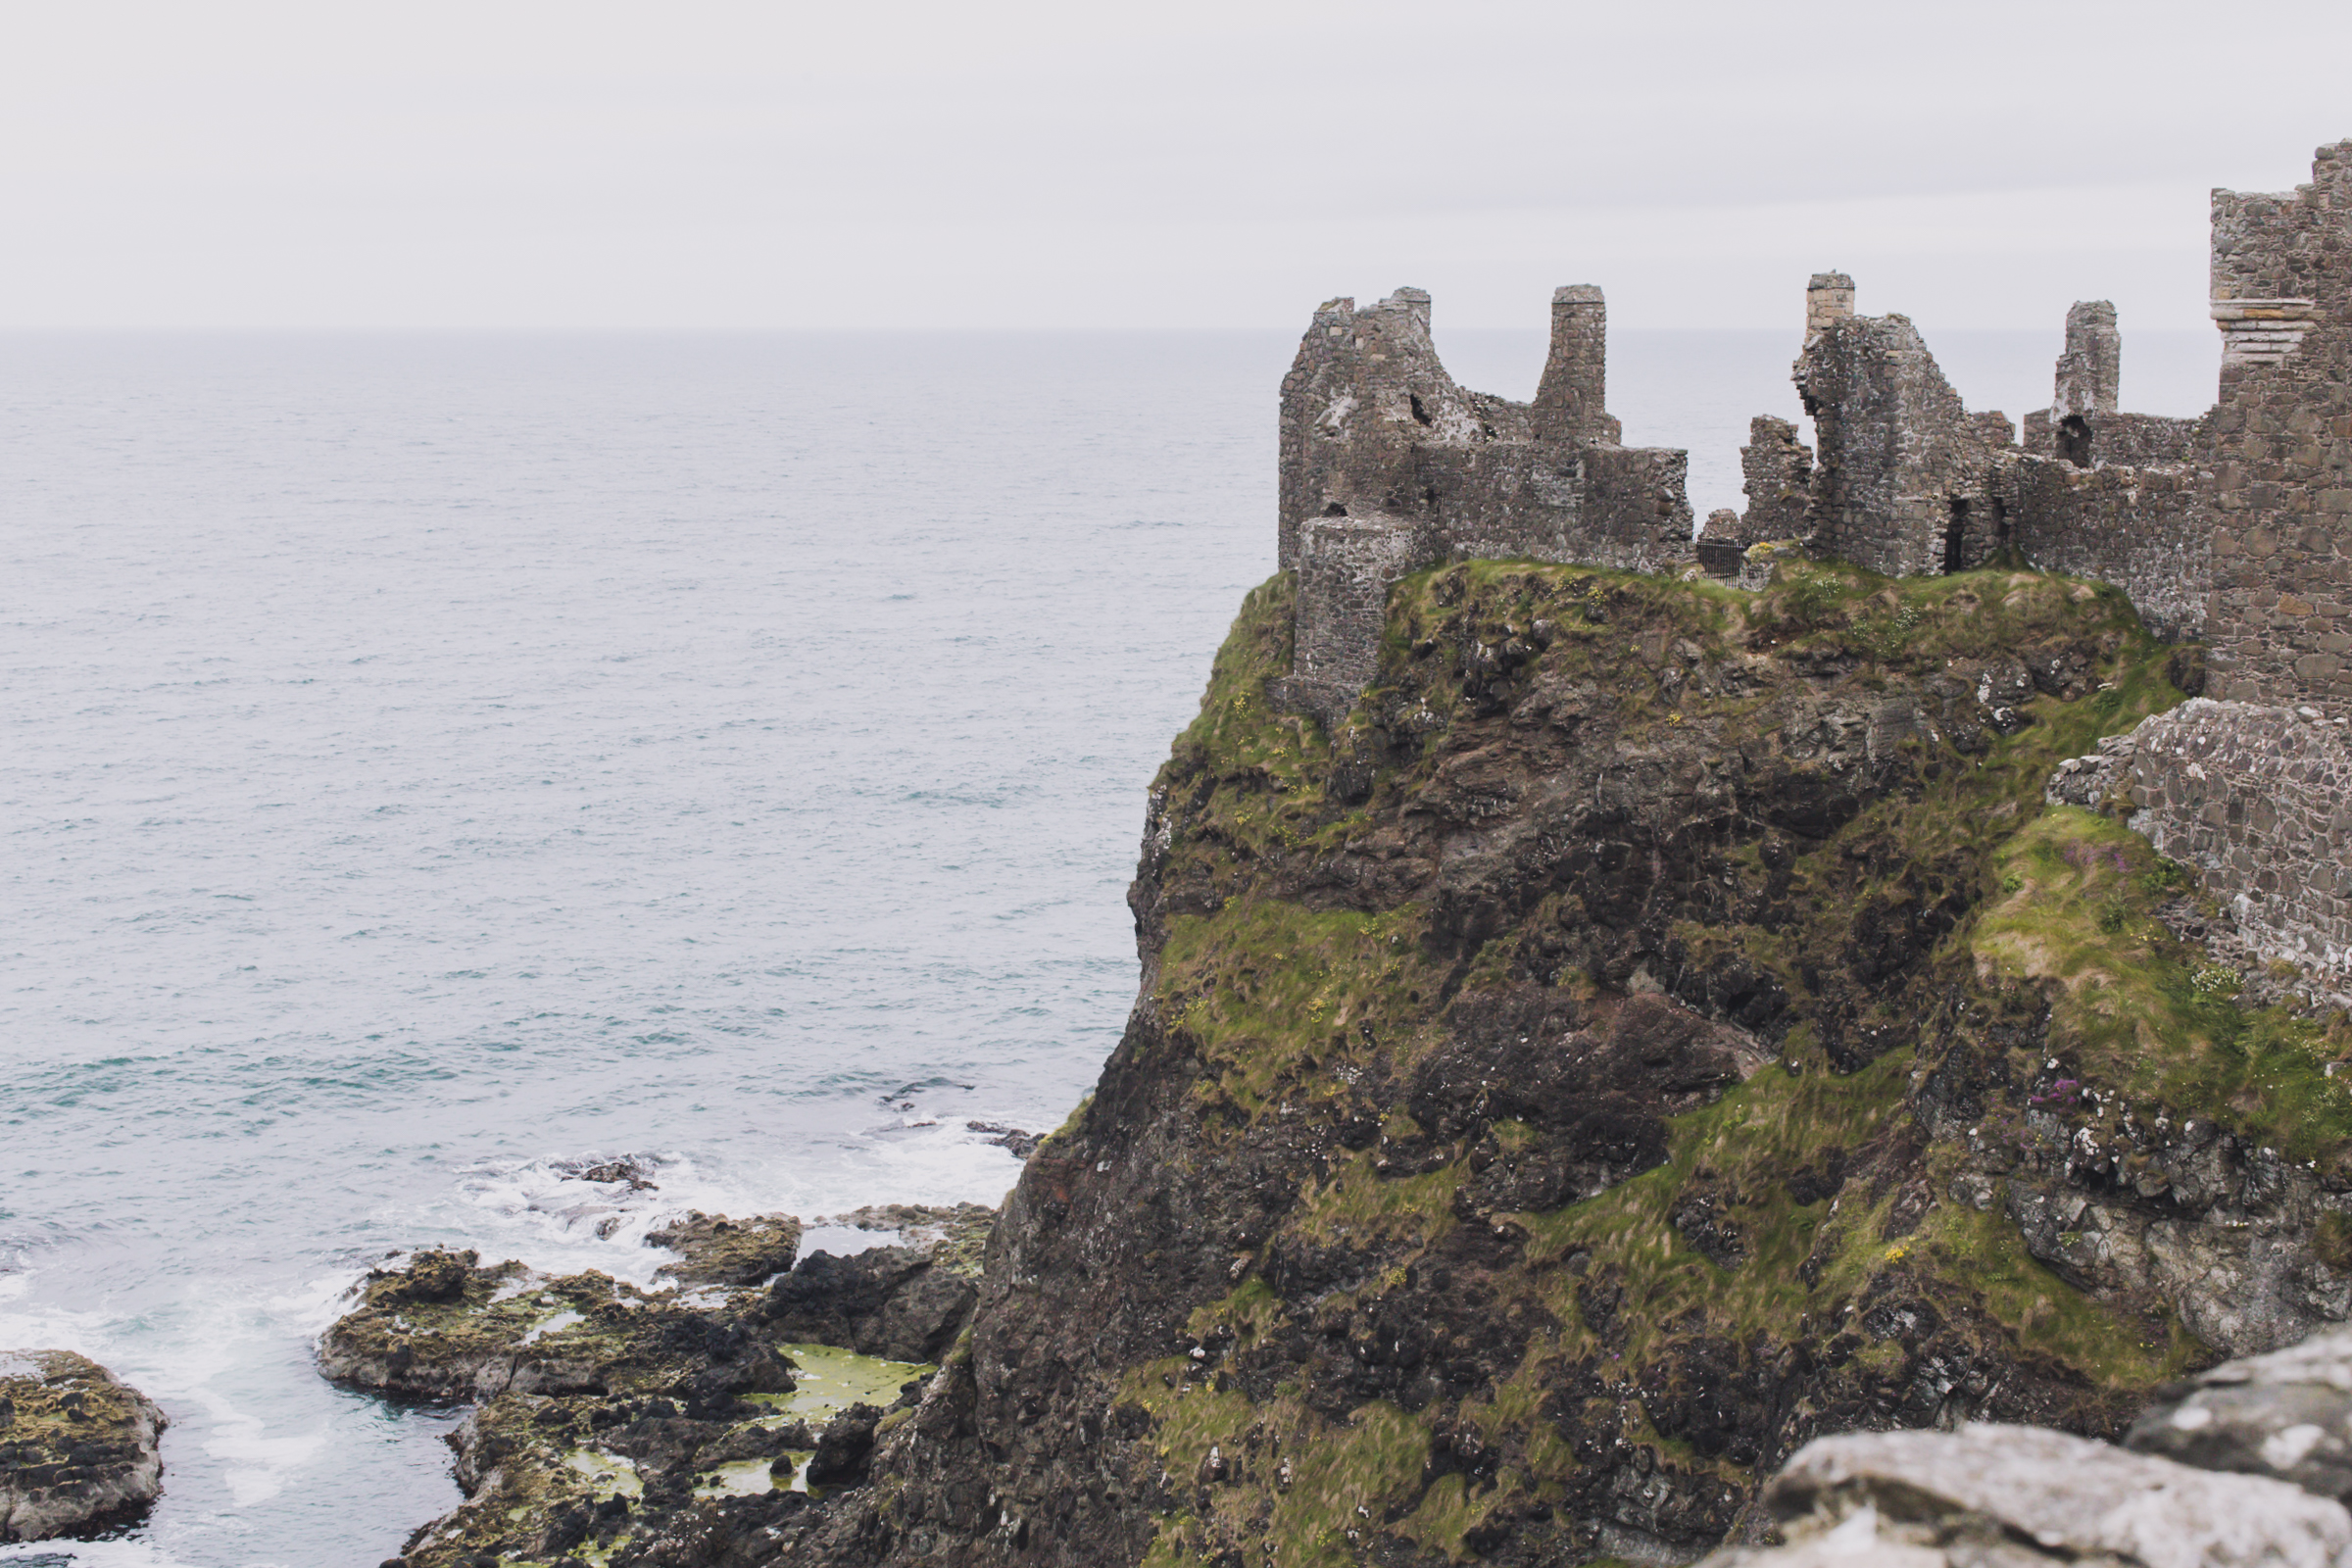 20150619-095-Ireland_Travel_Editorial.jpg